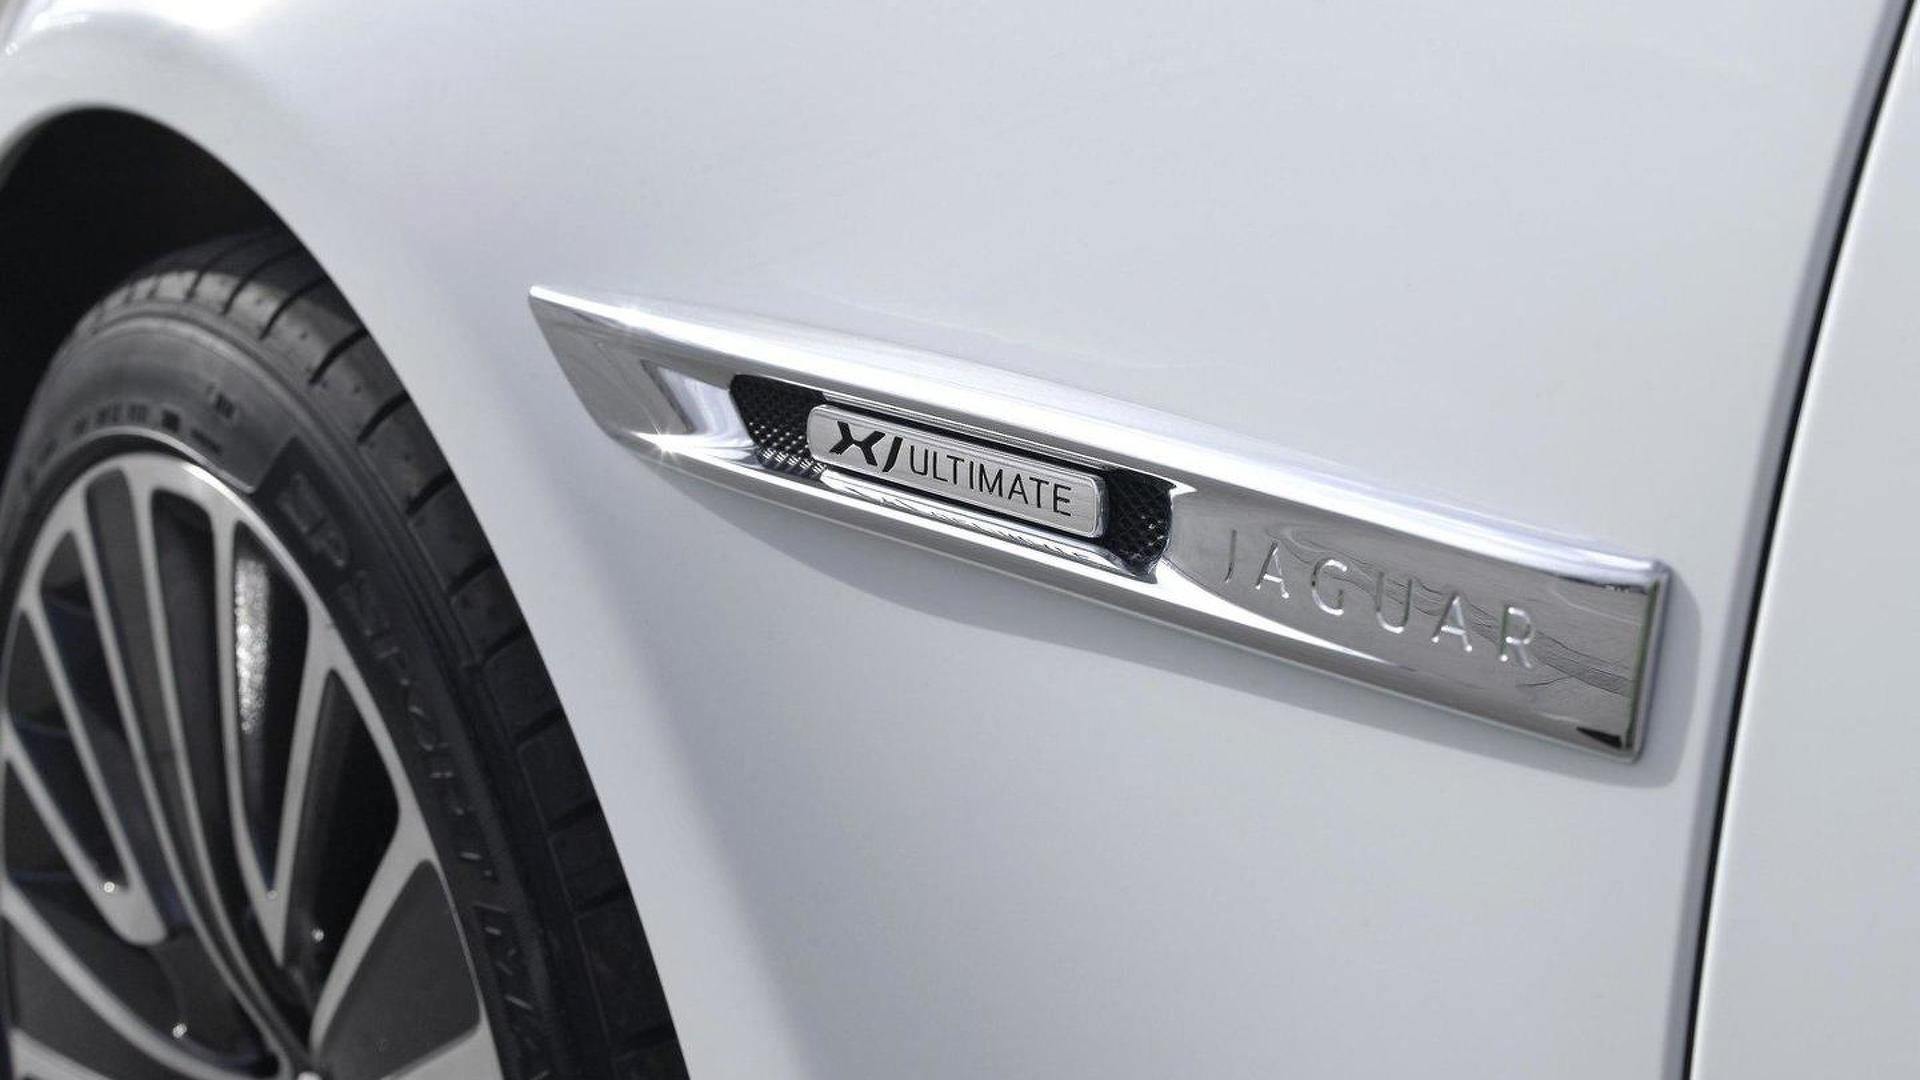 Jaguar XJ Ultimate revealed for Beijing